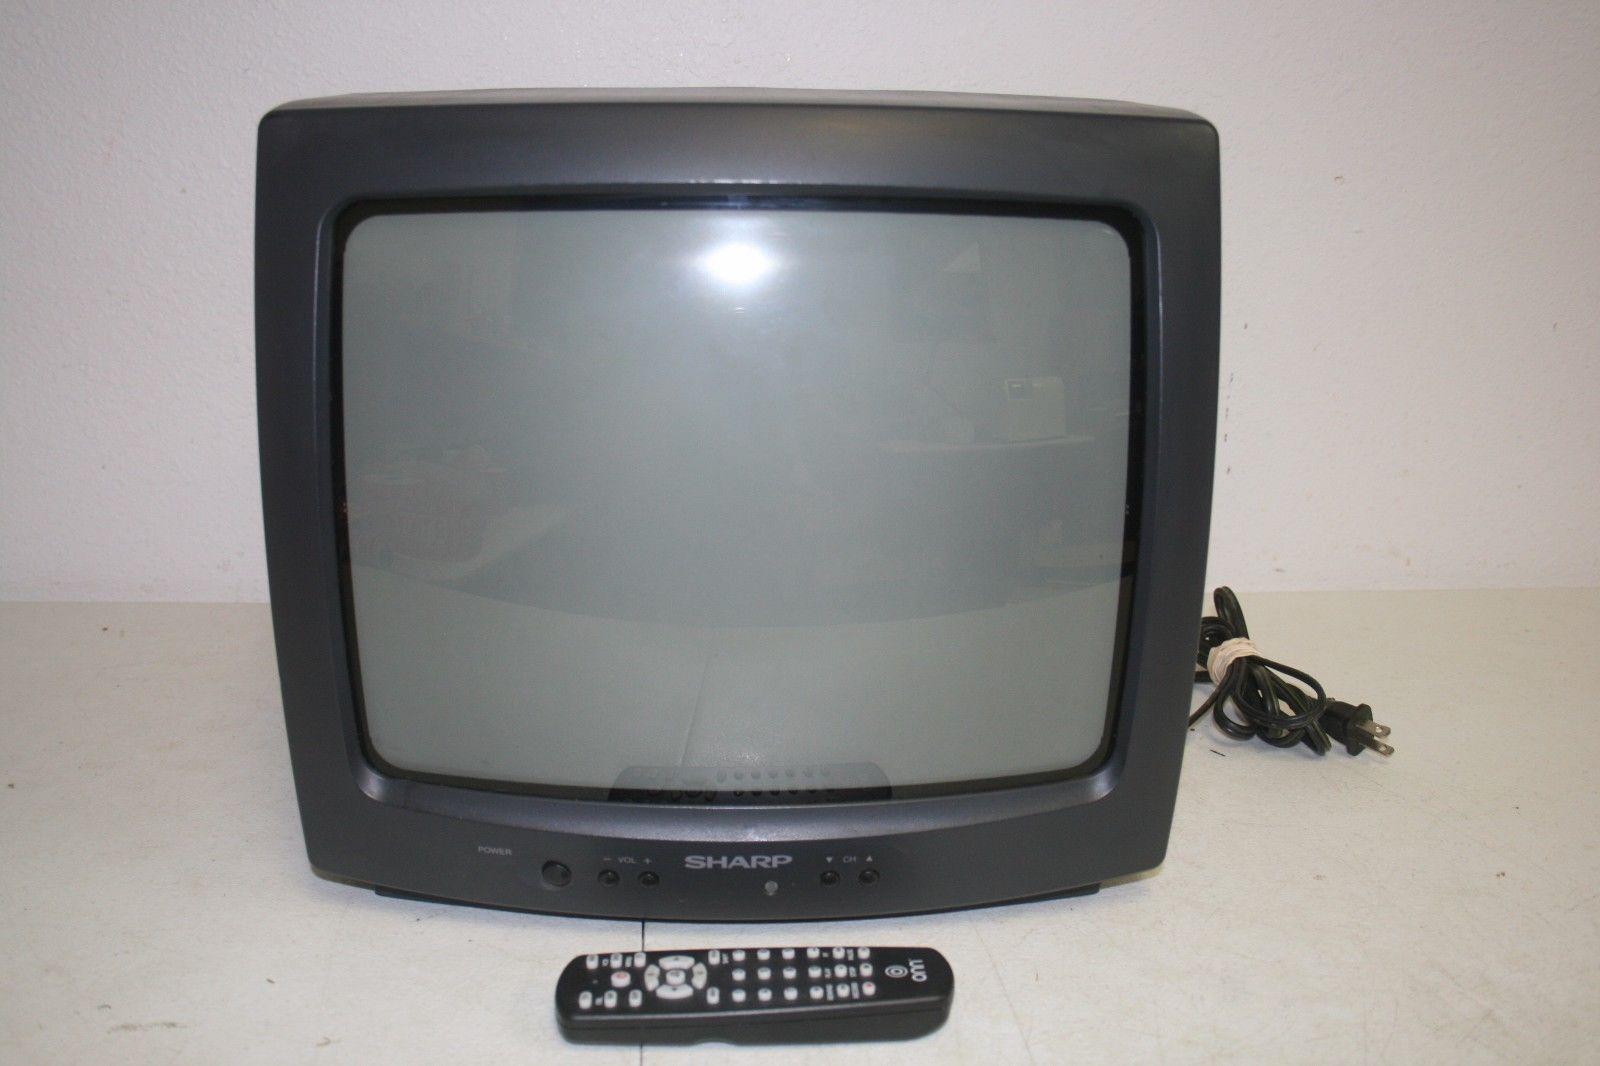 sharp nintendo television. sharp 13g m60 13\ nintendo television s